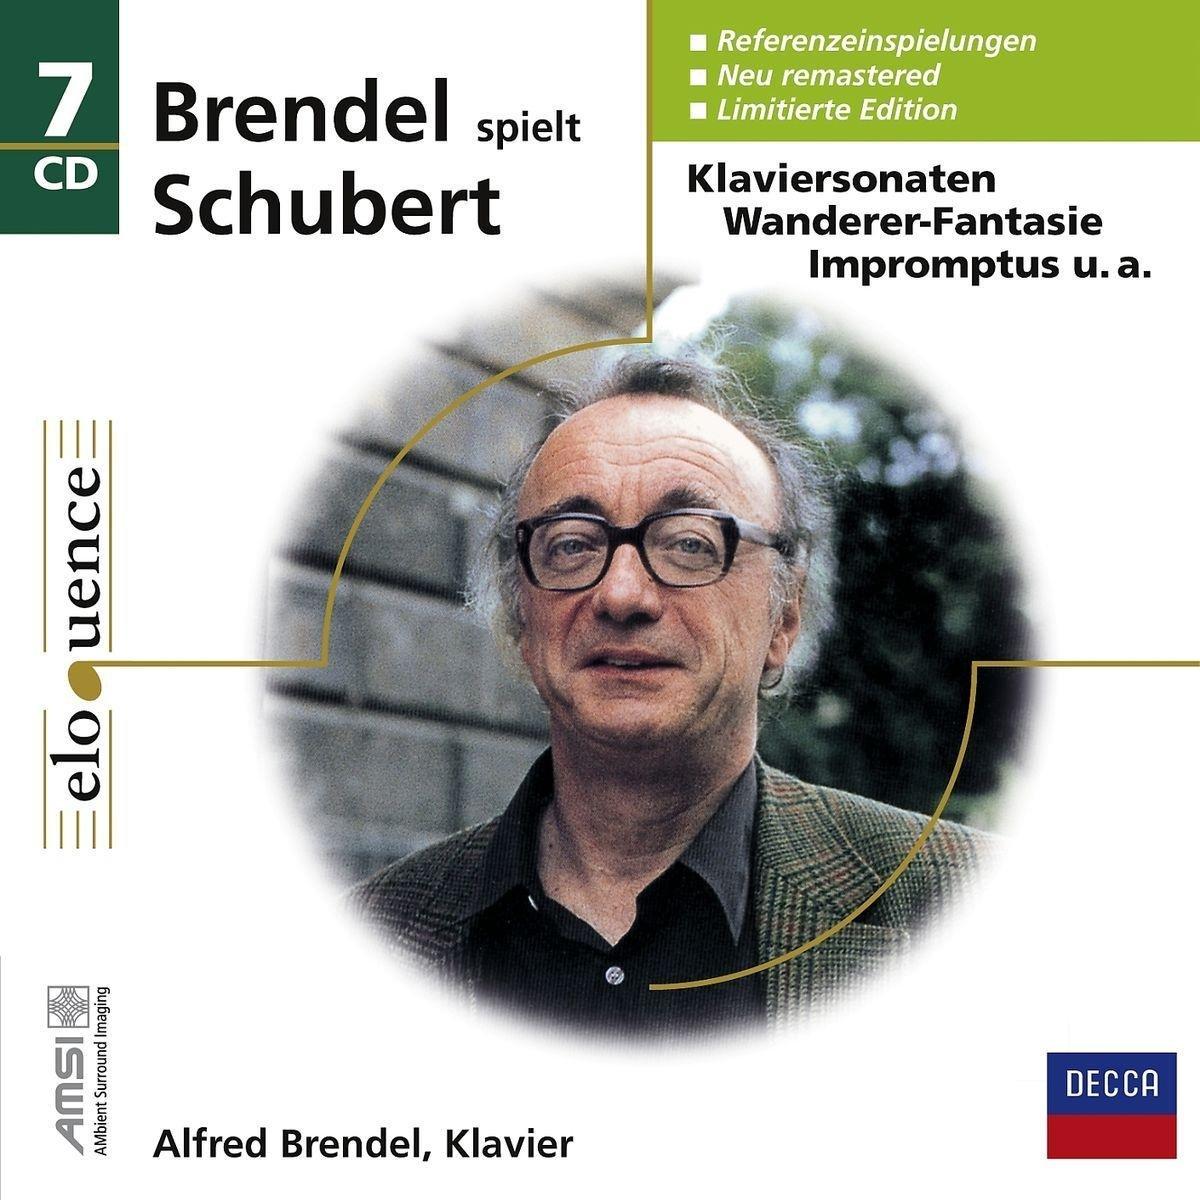 Brendel Schubertjpg